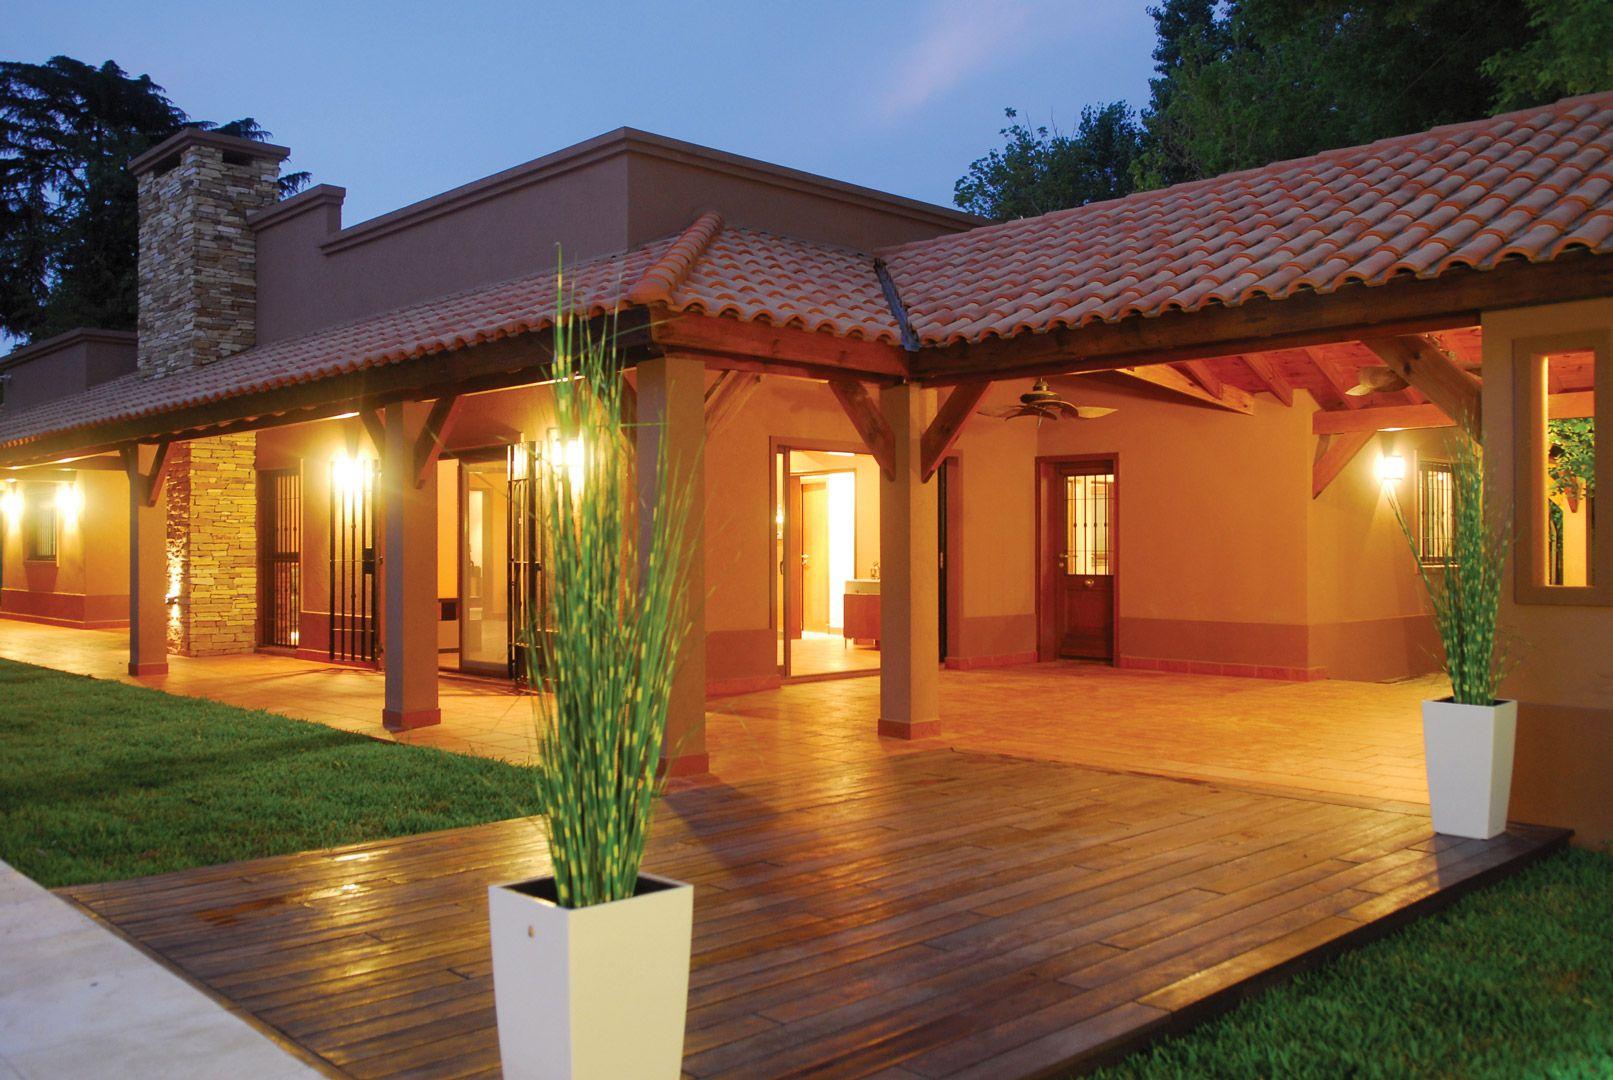 Perretta ocampo arquitectura en 2019 casas estilo for Casa moderno kl